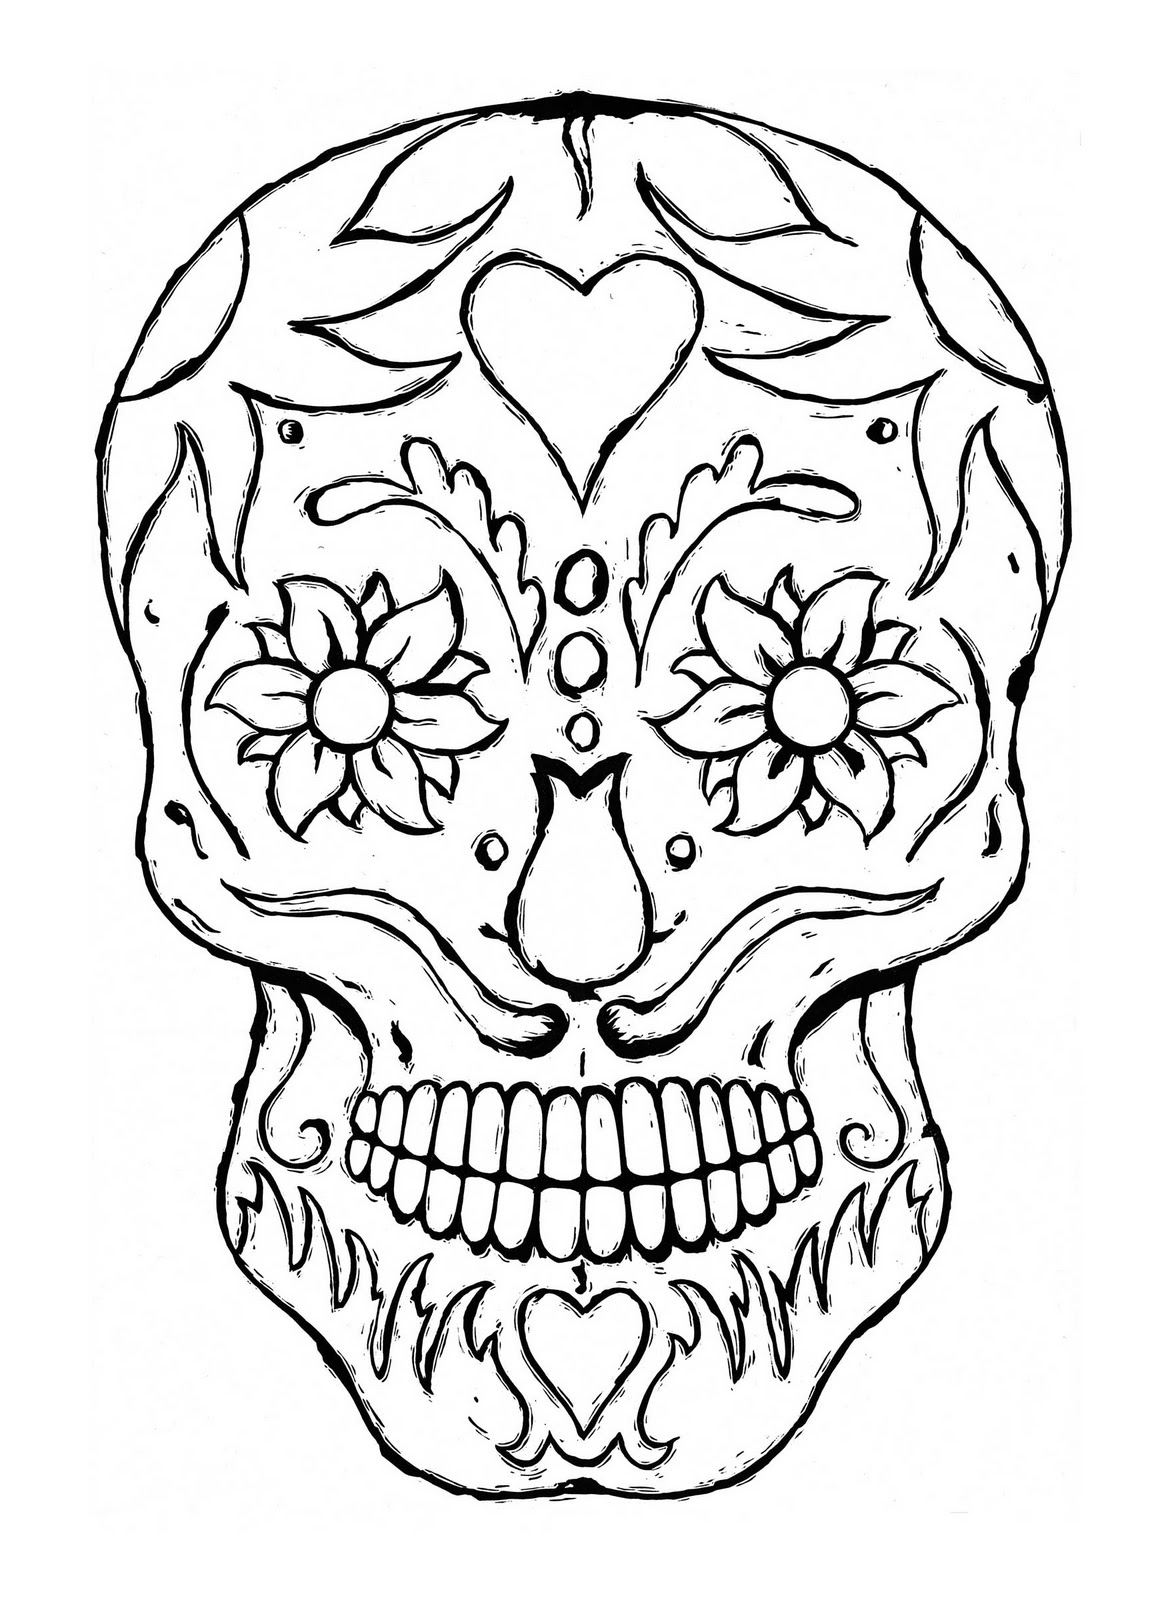 coloring pages sugar skulls - carren 39 s crafty corner february 2011